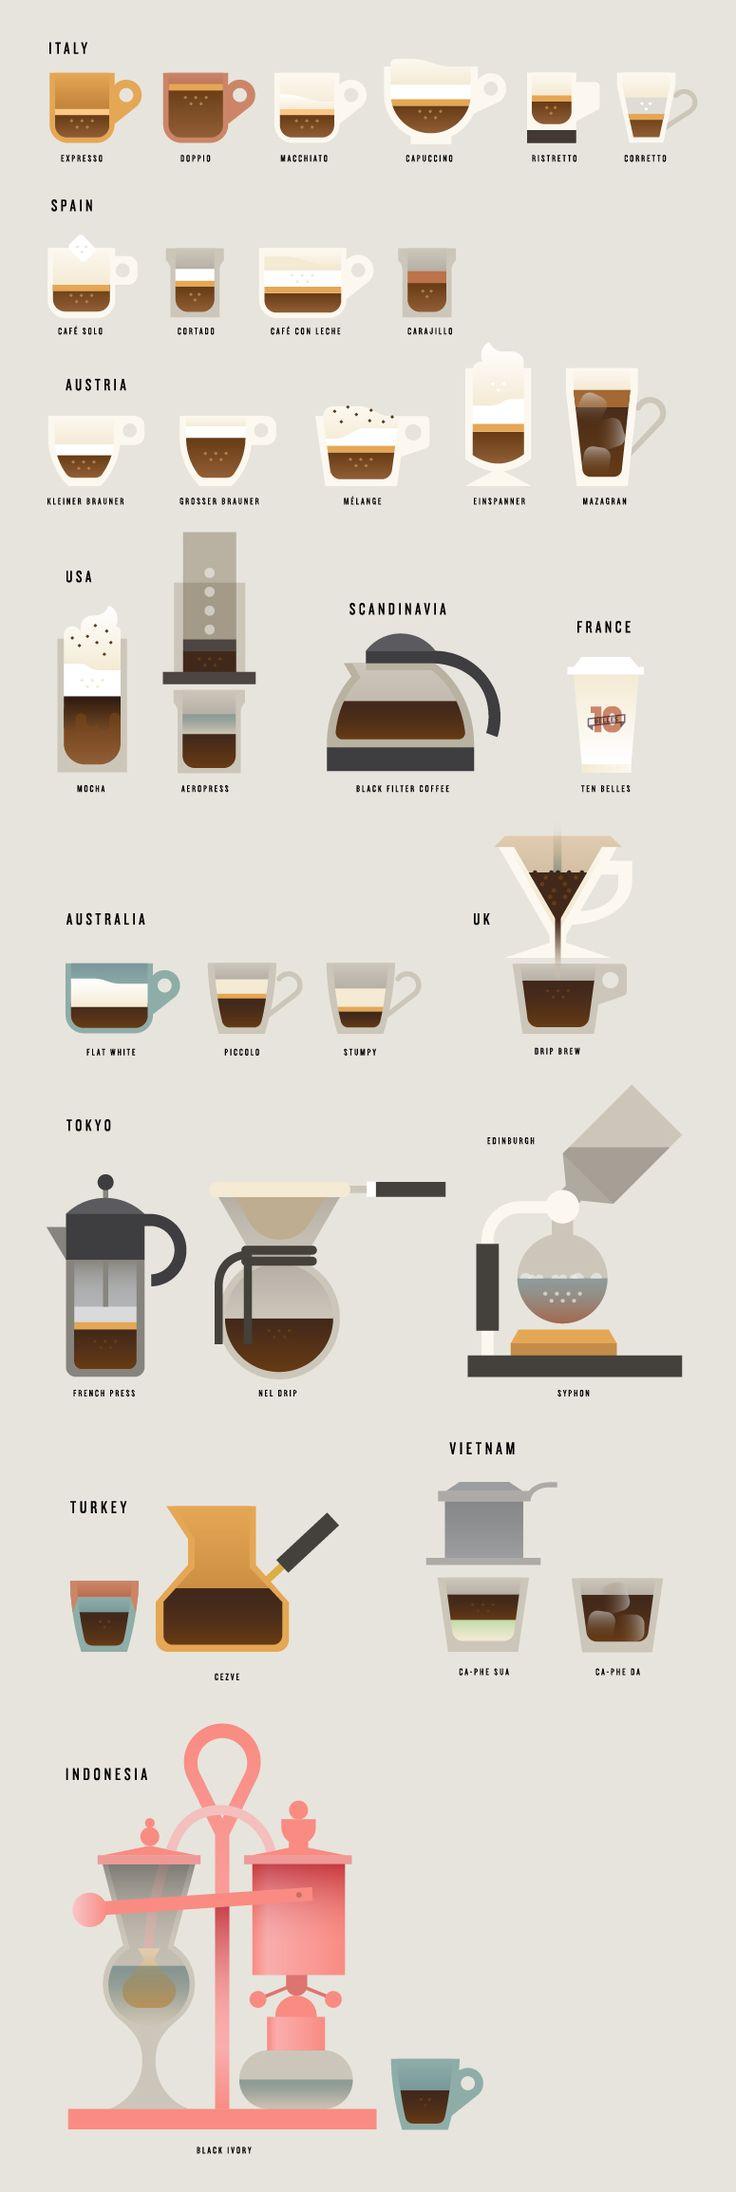 The world of coffee. | Coffee Shop: http://www.foodservicewarehouse.com/coffee-shop/c16210.aspx?utm_source=social&utm_medium=pinterest&utm_campaign=site